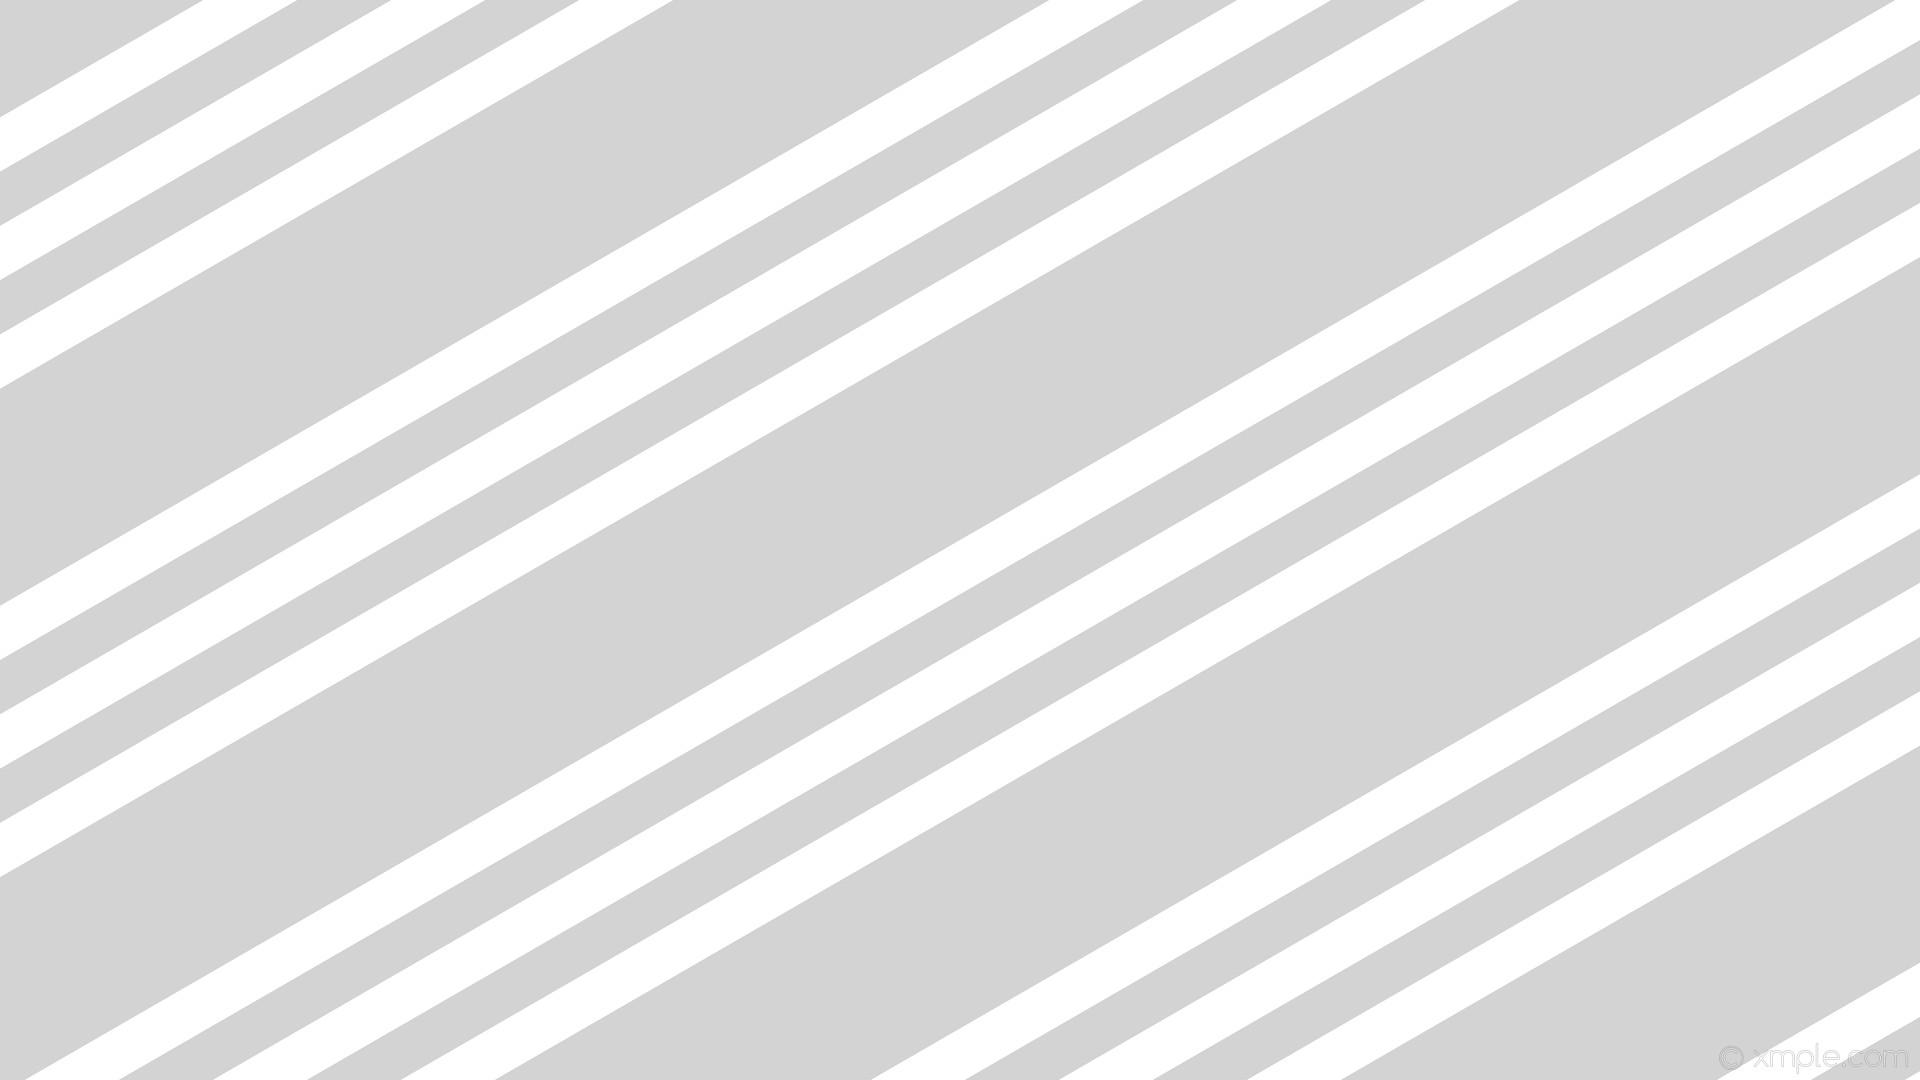 wallpaper stripes grey lines streaks white light gray #ffffff #d3d3d3  diagonal 30° 47px